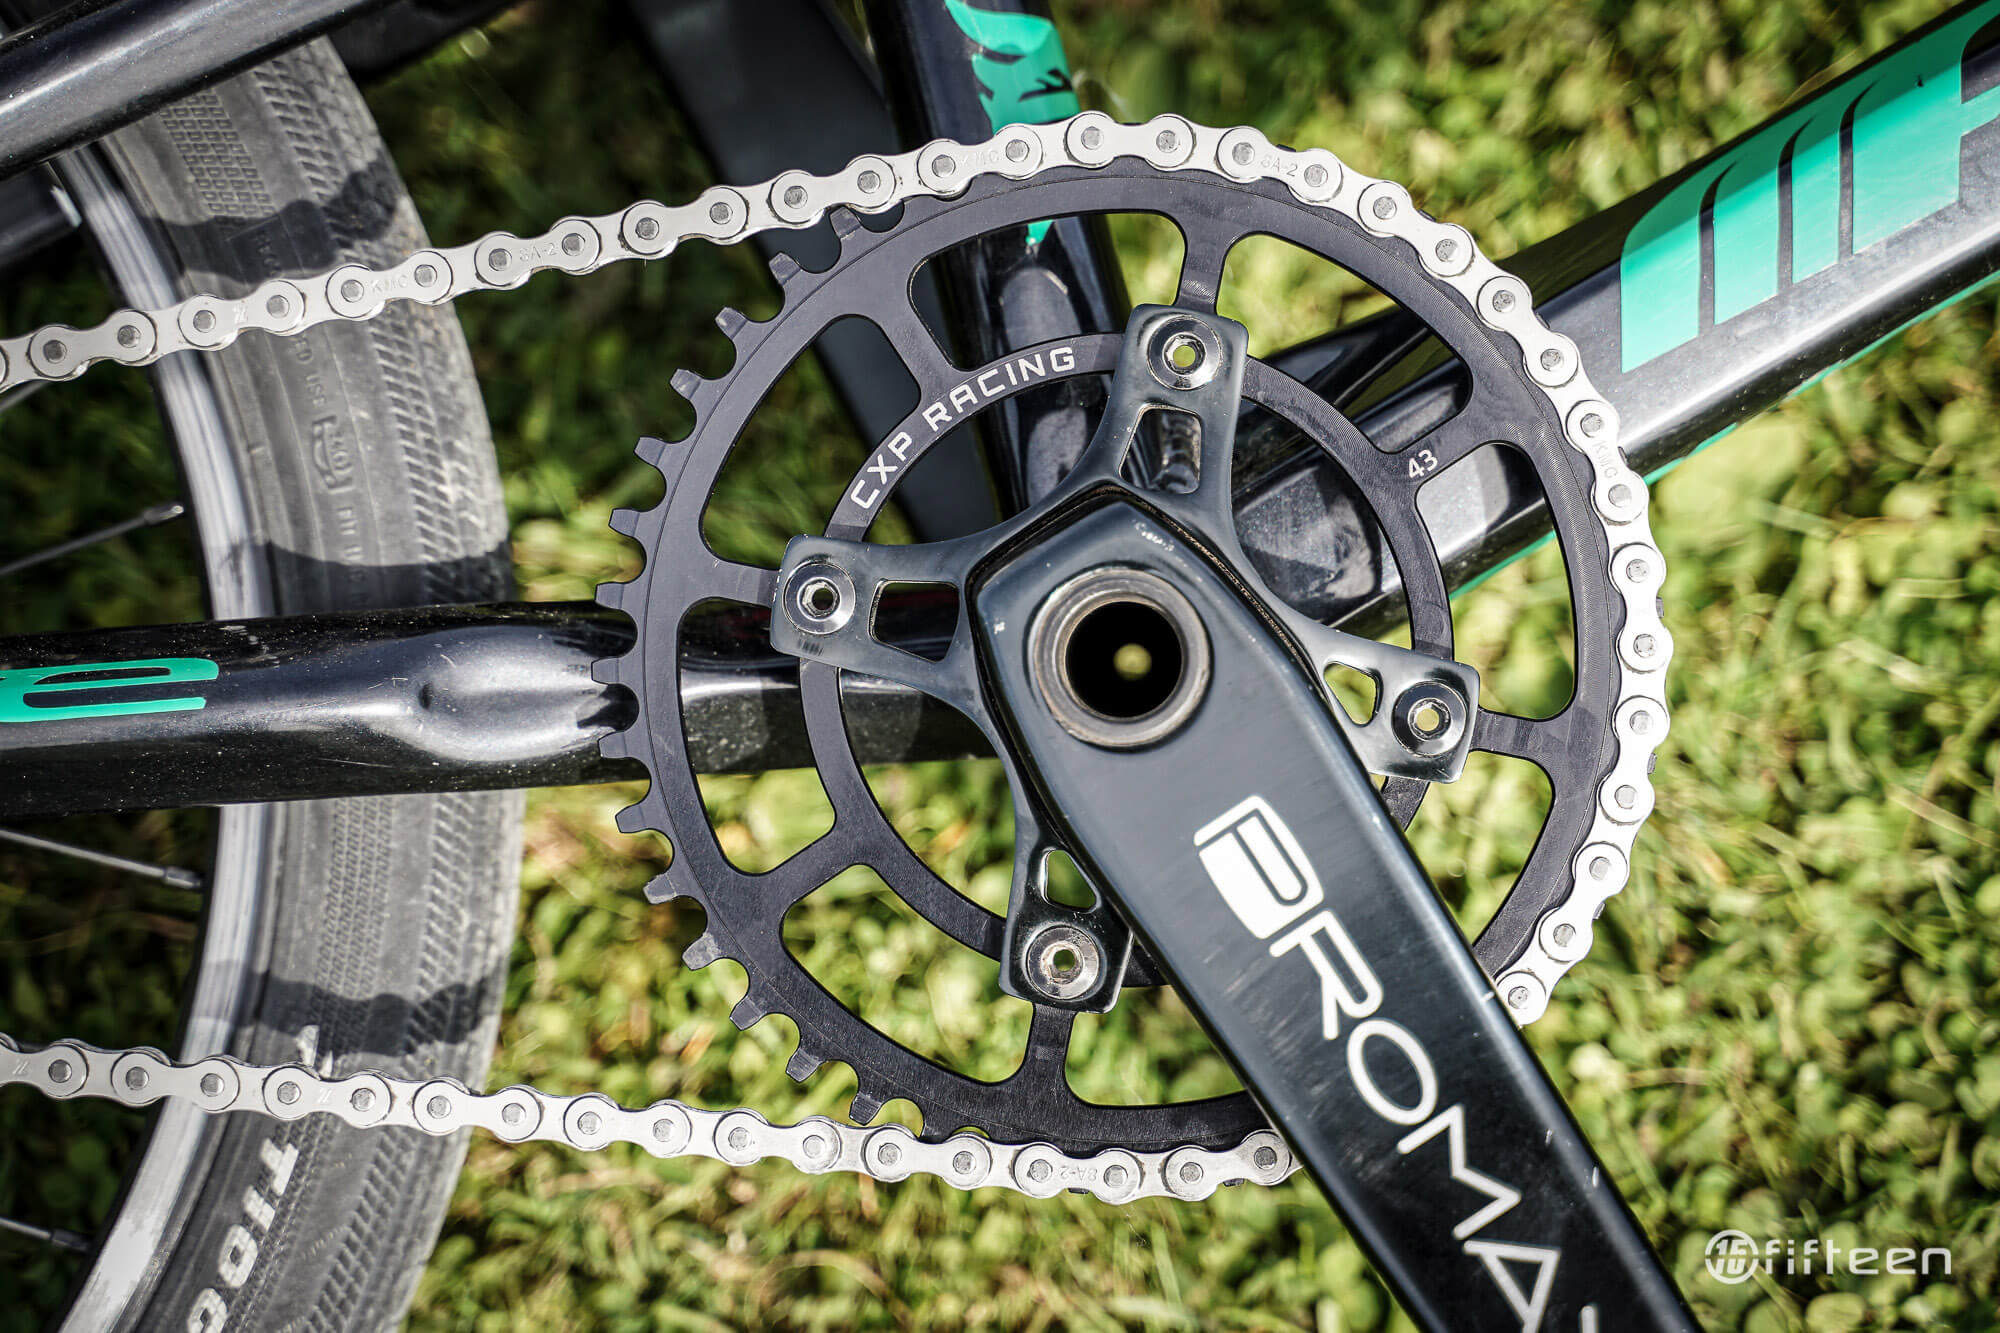 CXP Racing Chainring - Fifteen BMX